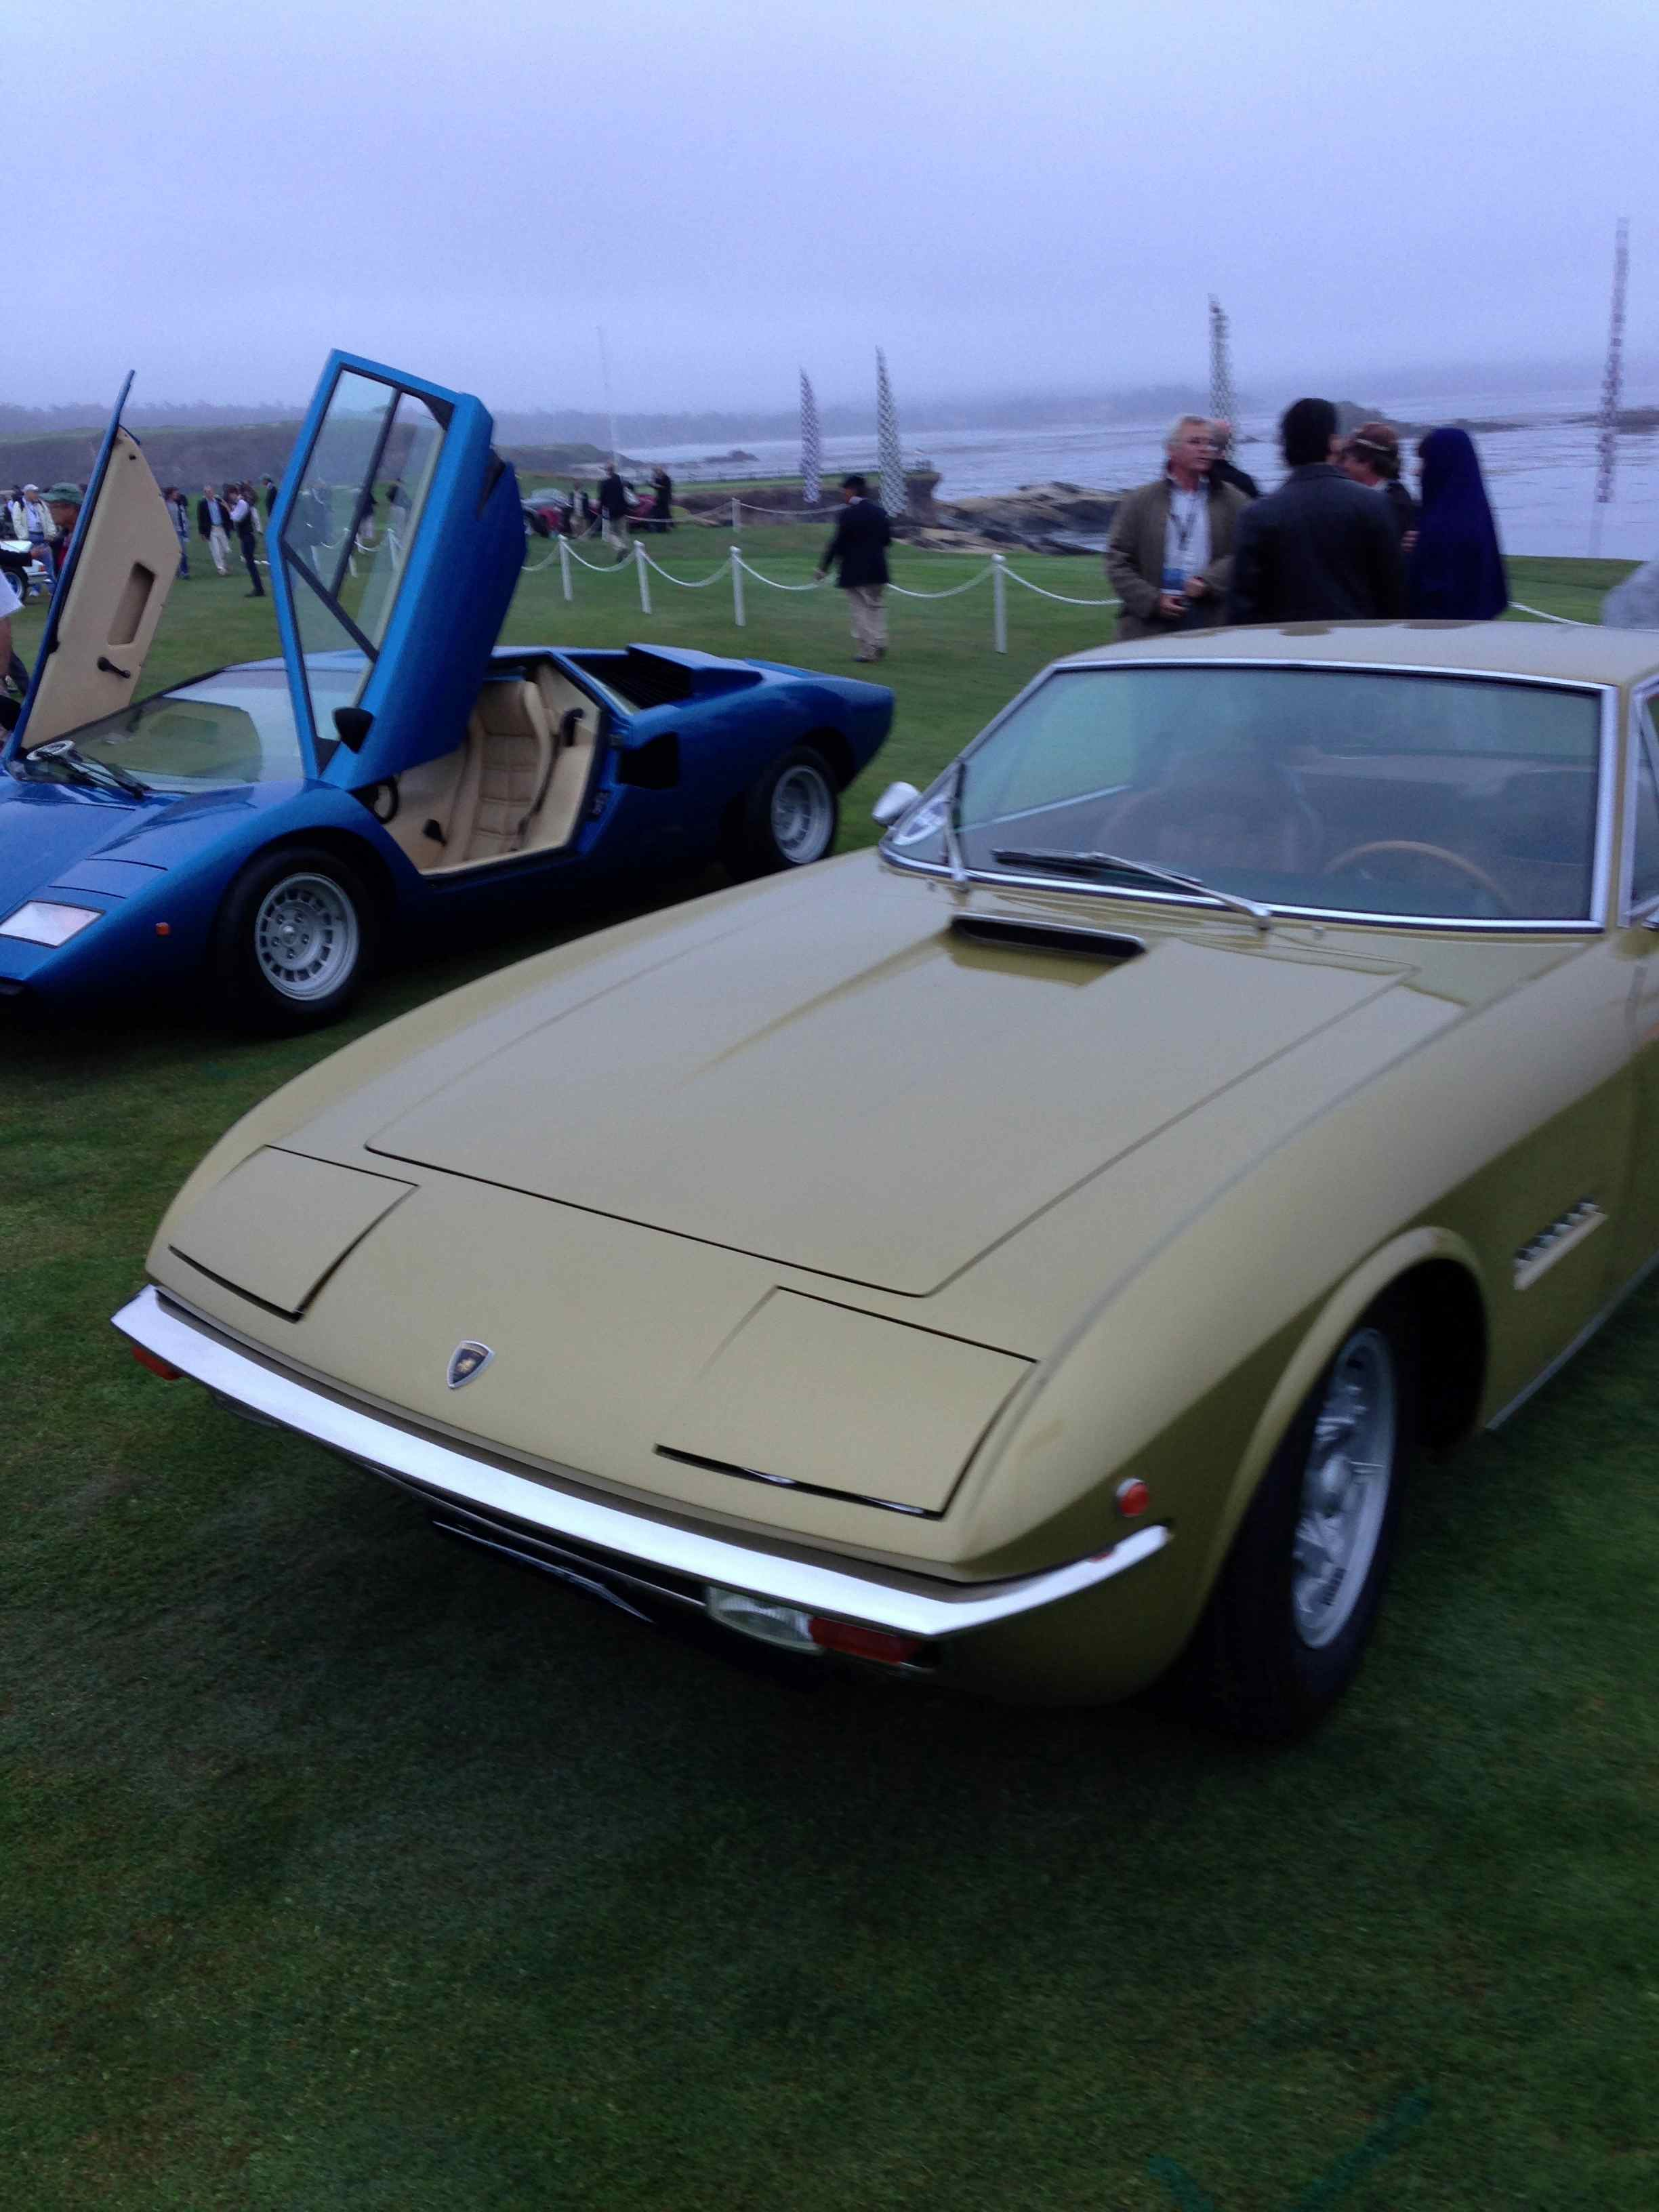 By the dawn's early light, Lamborghini Islero and Countach